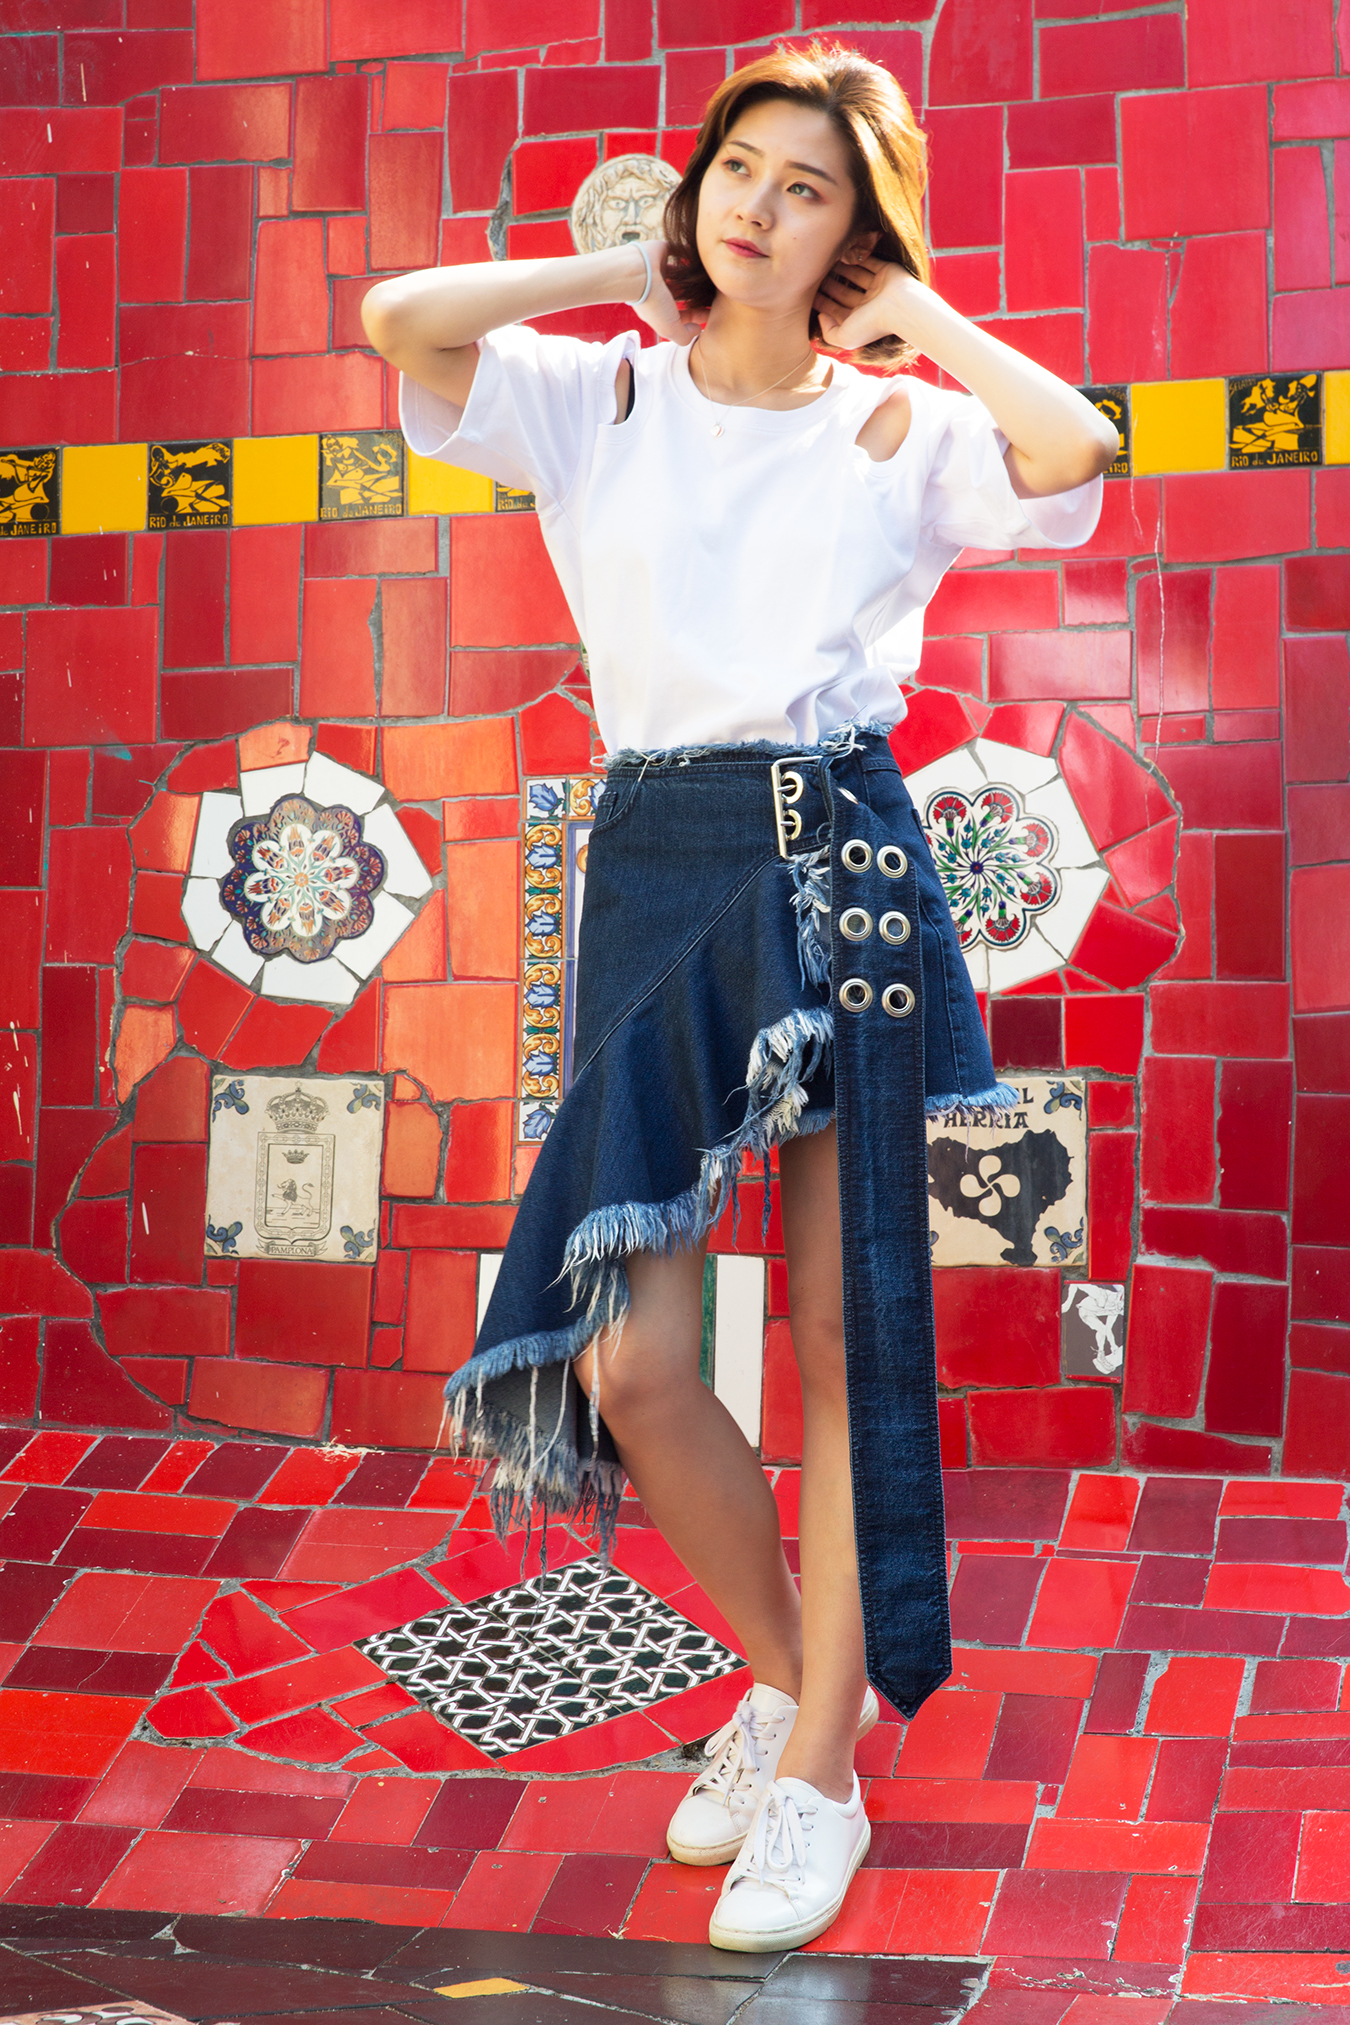 white_shirt_red_wall_rio